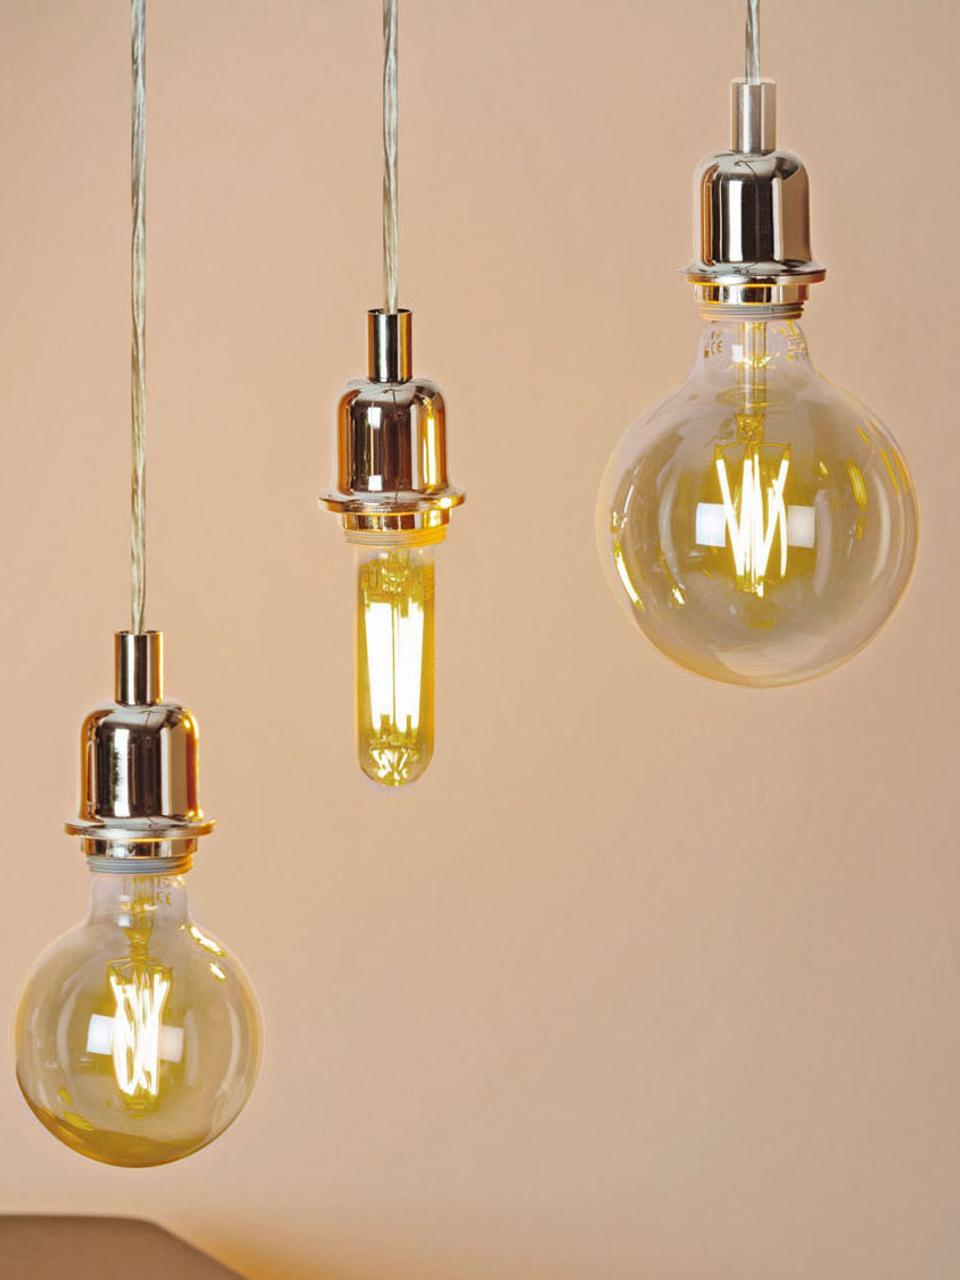 Lampadina a LED  Cross (E27 / 4Watt) 5 pz, Lampadina: vetro, Trasparente ambra, Ø 13 x Alt. 17 cm